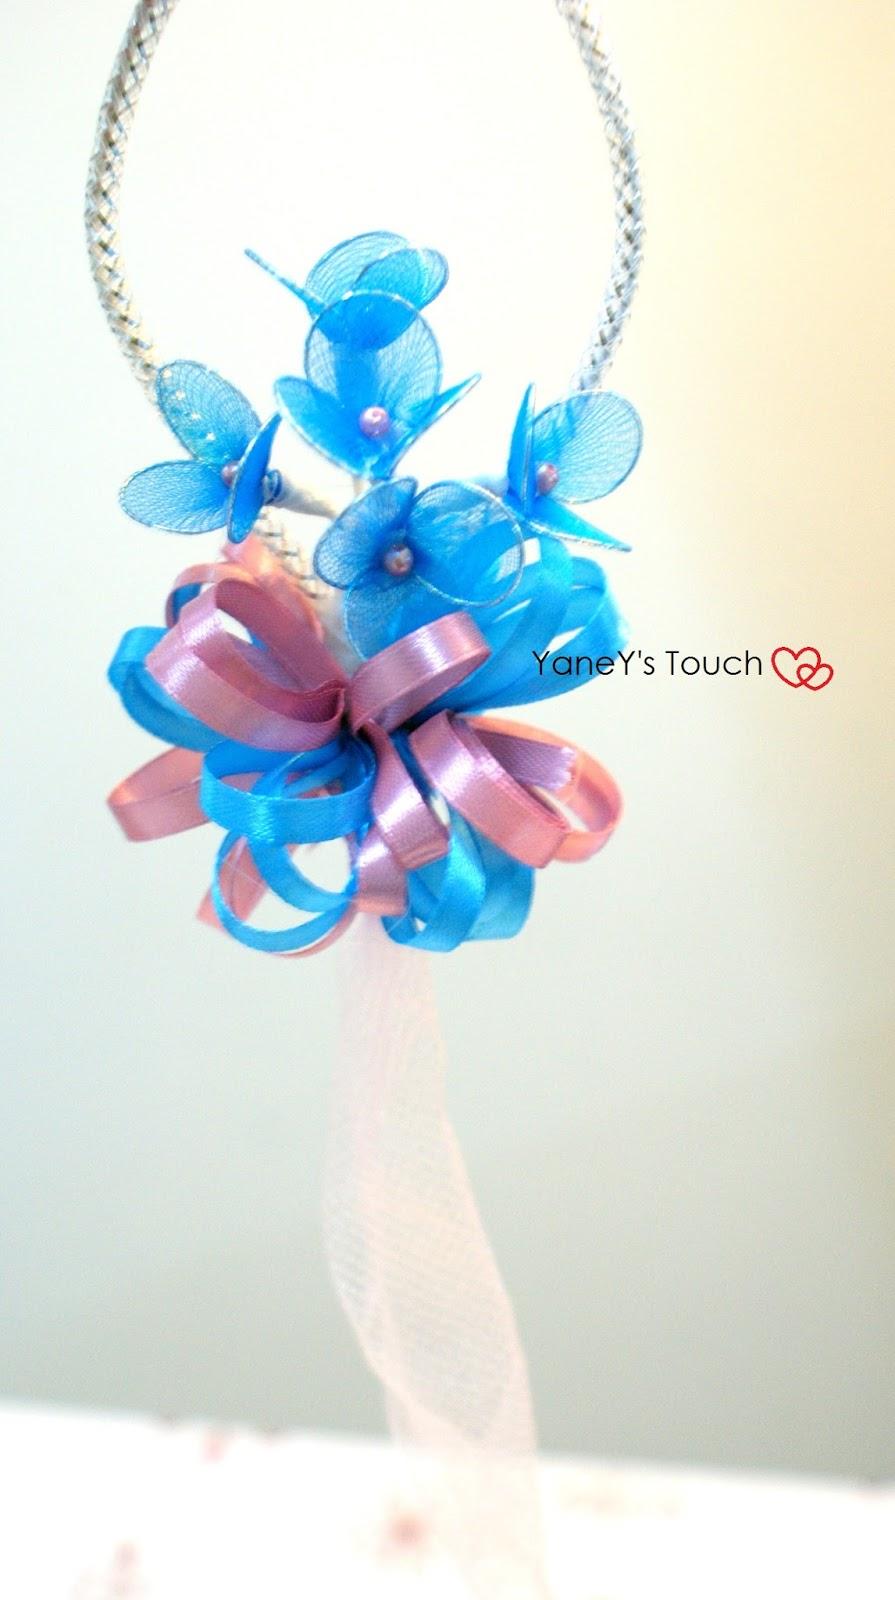 bunga telur stokin gantung: tema turqoise + pink: 5 kuntum (3 kelopak)